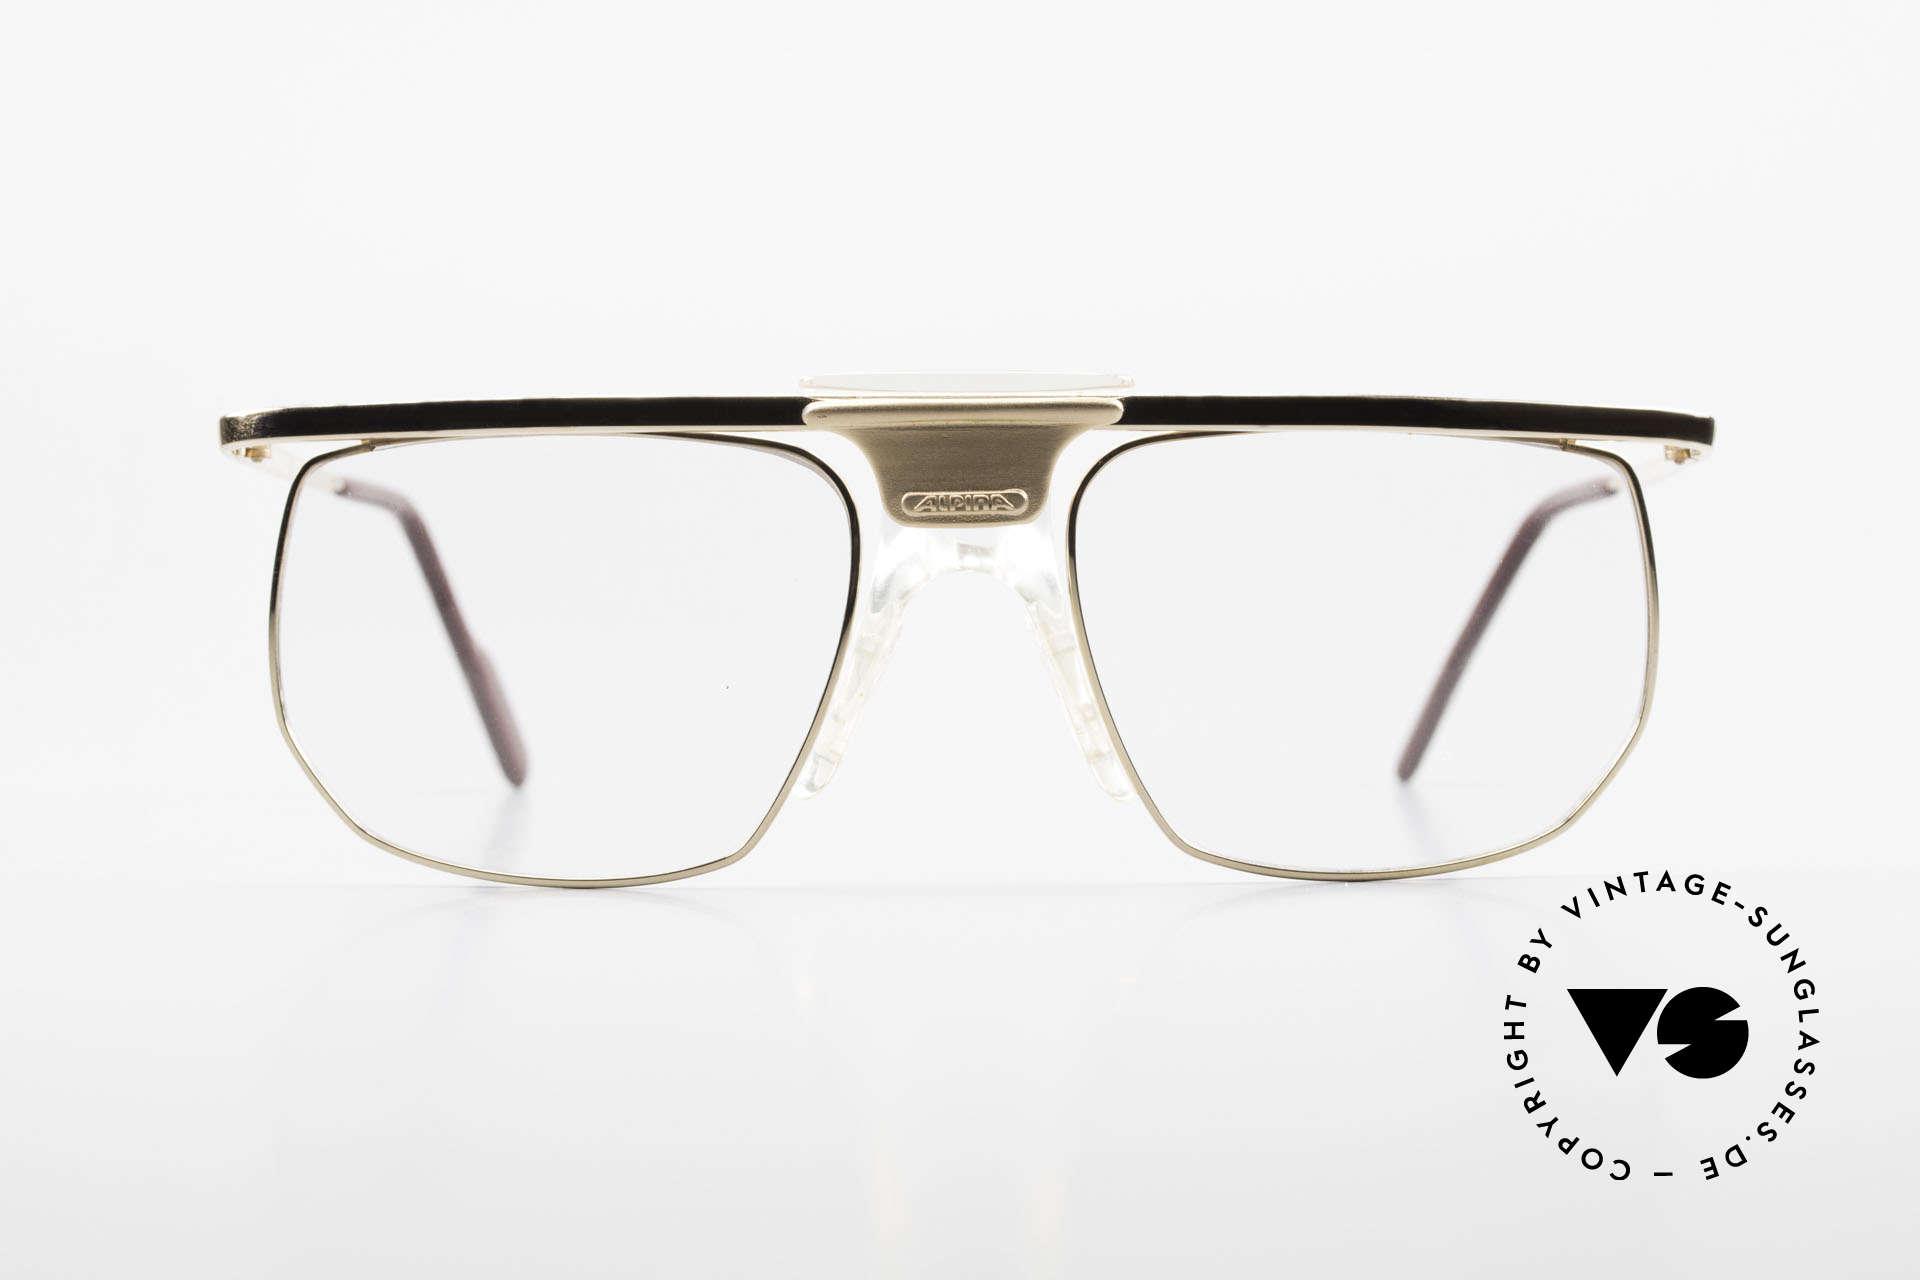 Alpina PSO 905 Vintage Glasses Saddle Bridge, gold-plated frame with a striking nose bridge, Made for Men